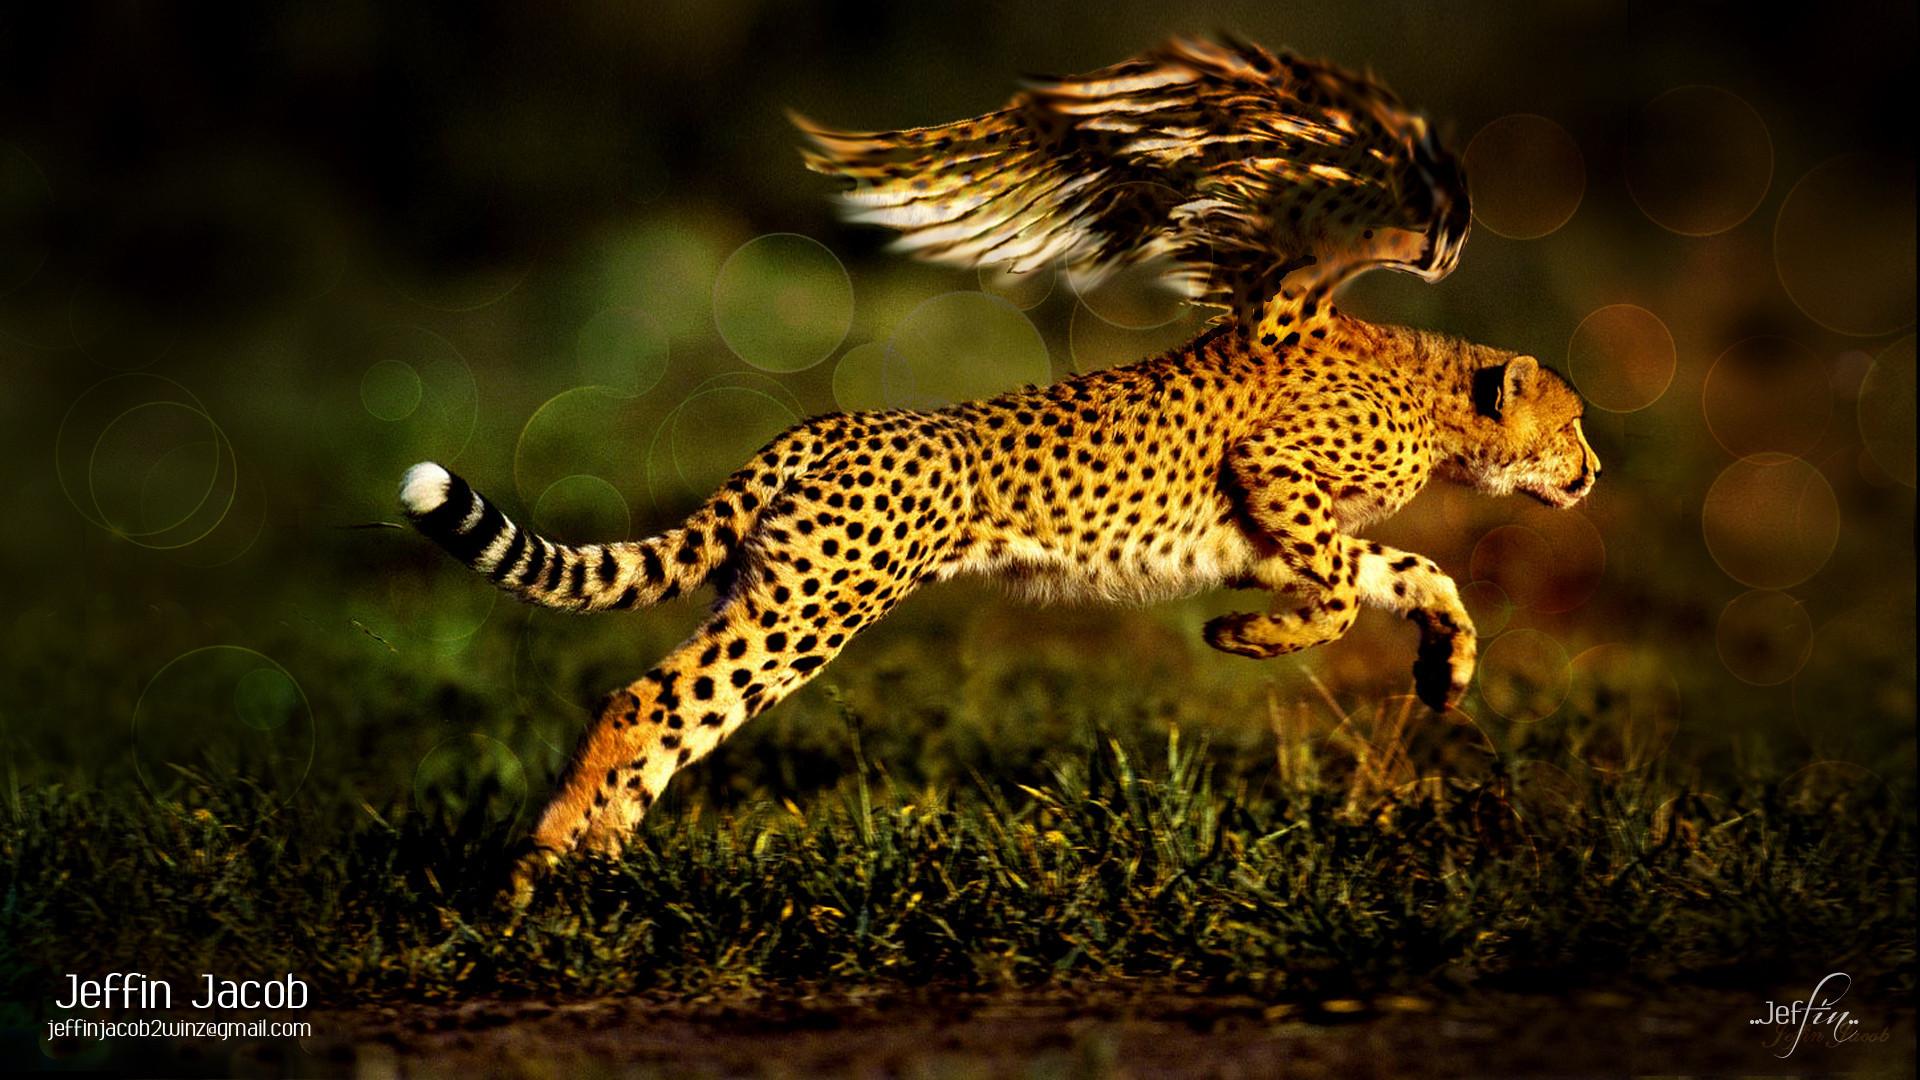 Cheetah Wallpaper The Wallpaper